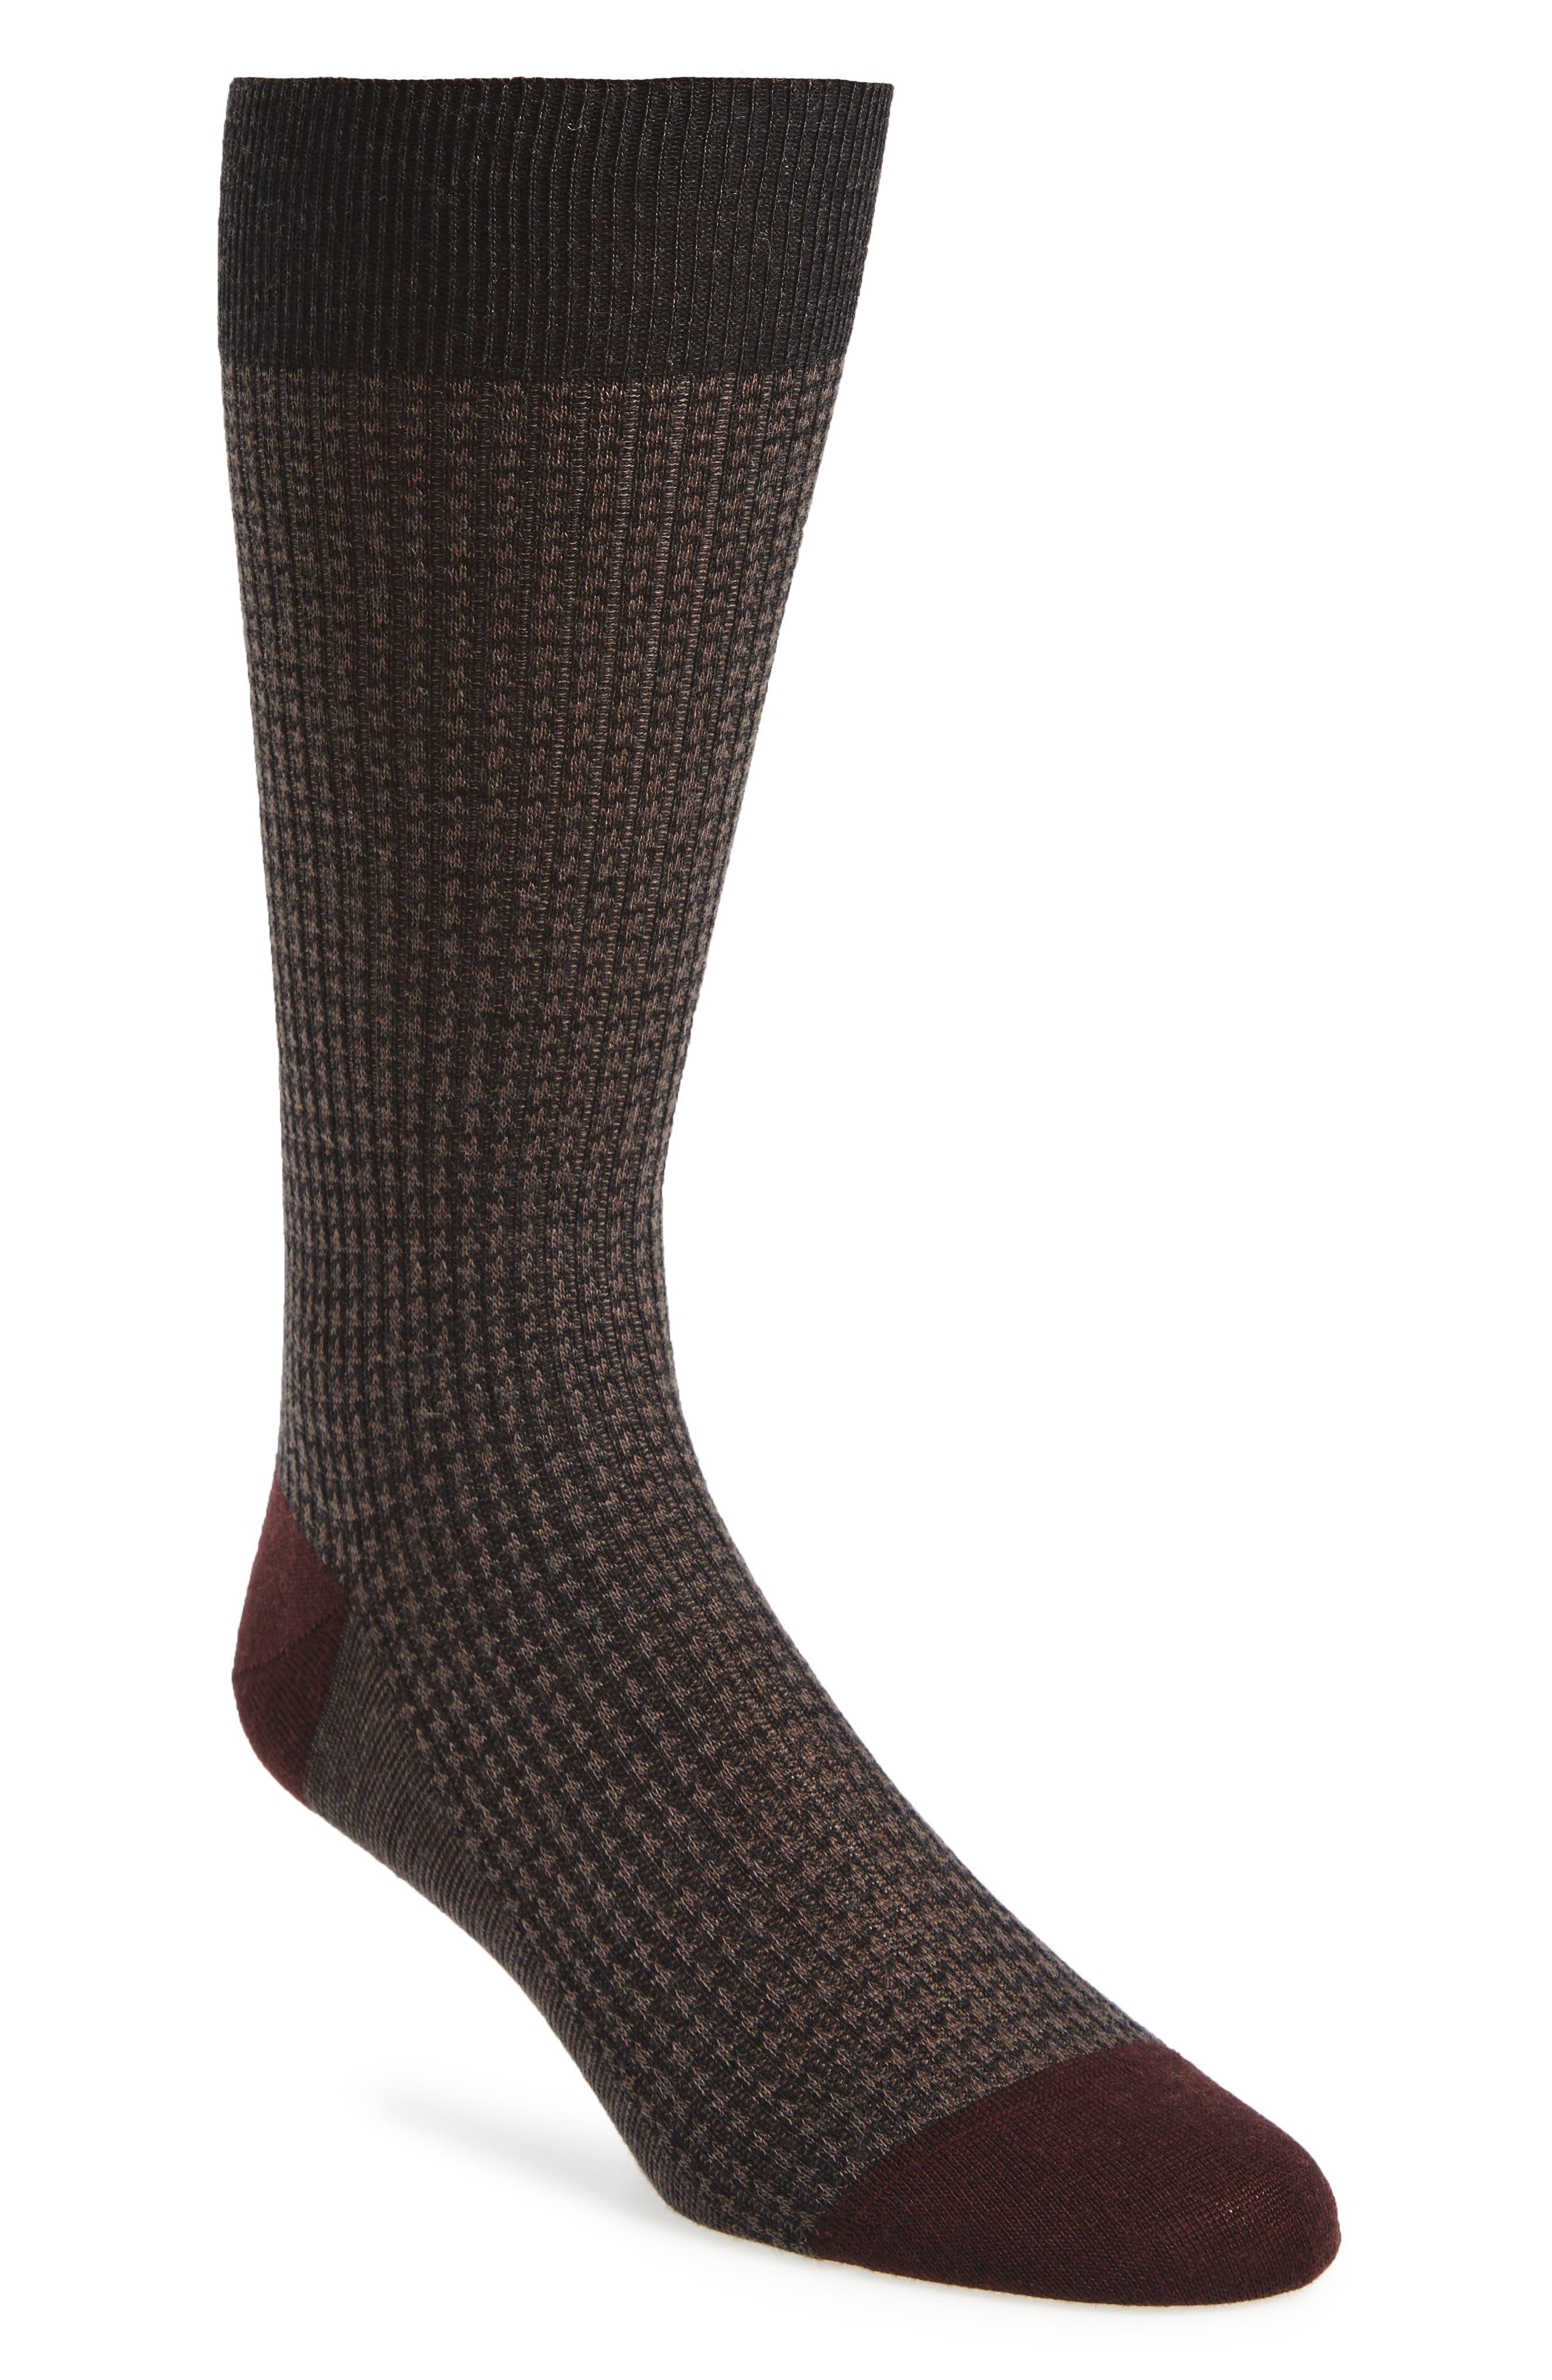 Main Image - Pantherella Houndstooth Wool Blend Socks